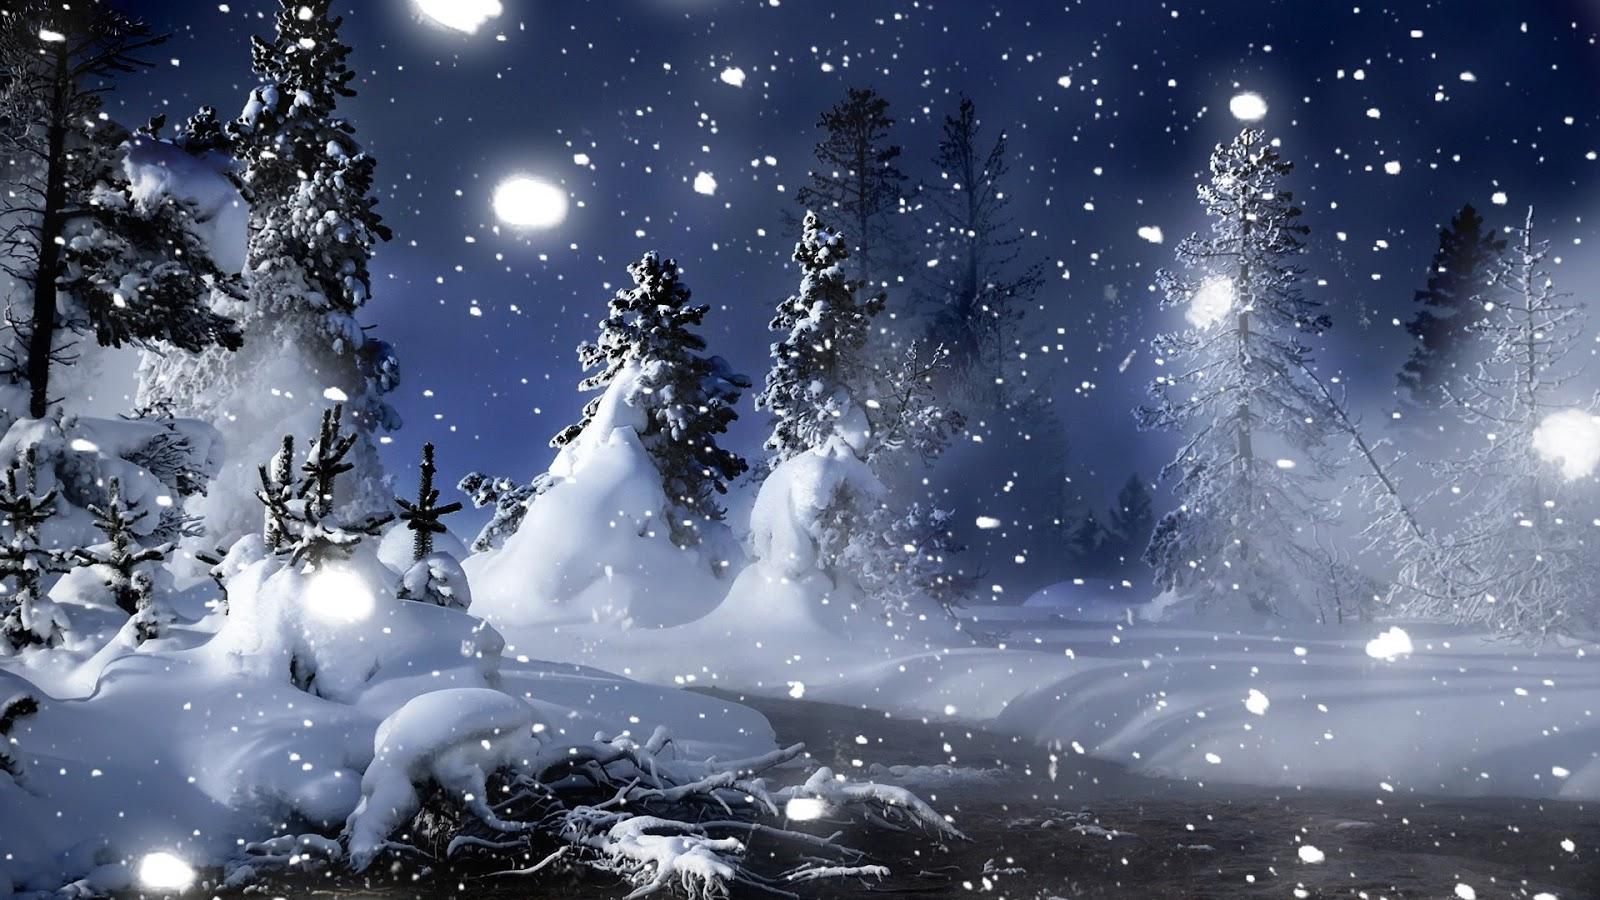 HD Winter Wallpapers 1080p